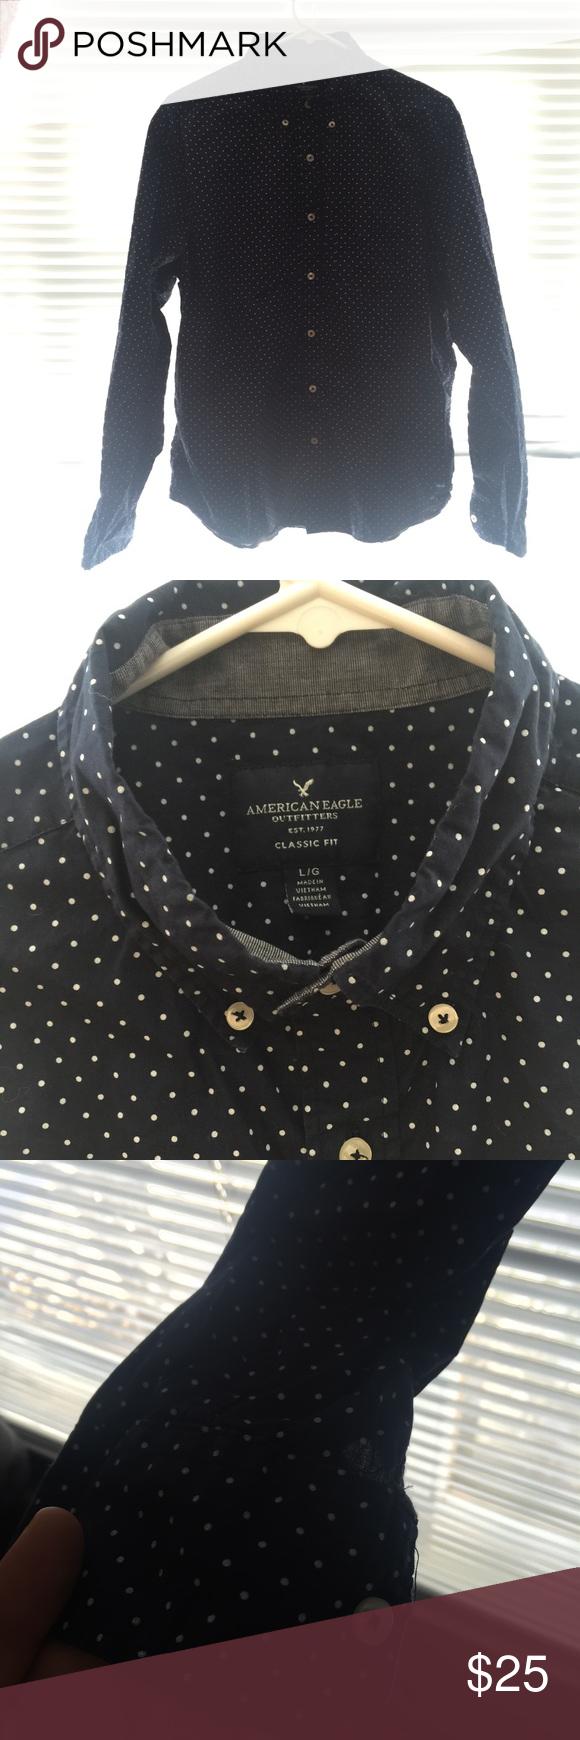 American eagle dress shirt Perfect semi formal shirt American Eagle Outfitters Shirts Dress Shirts